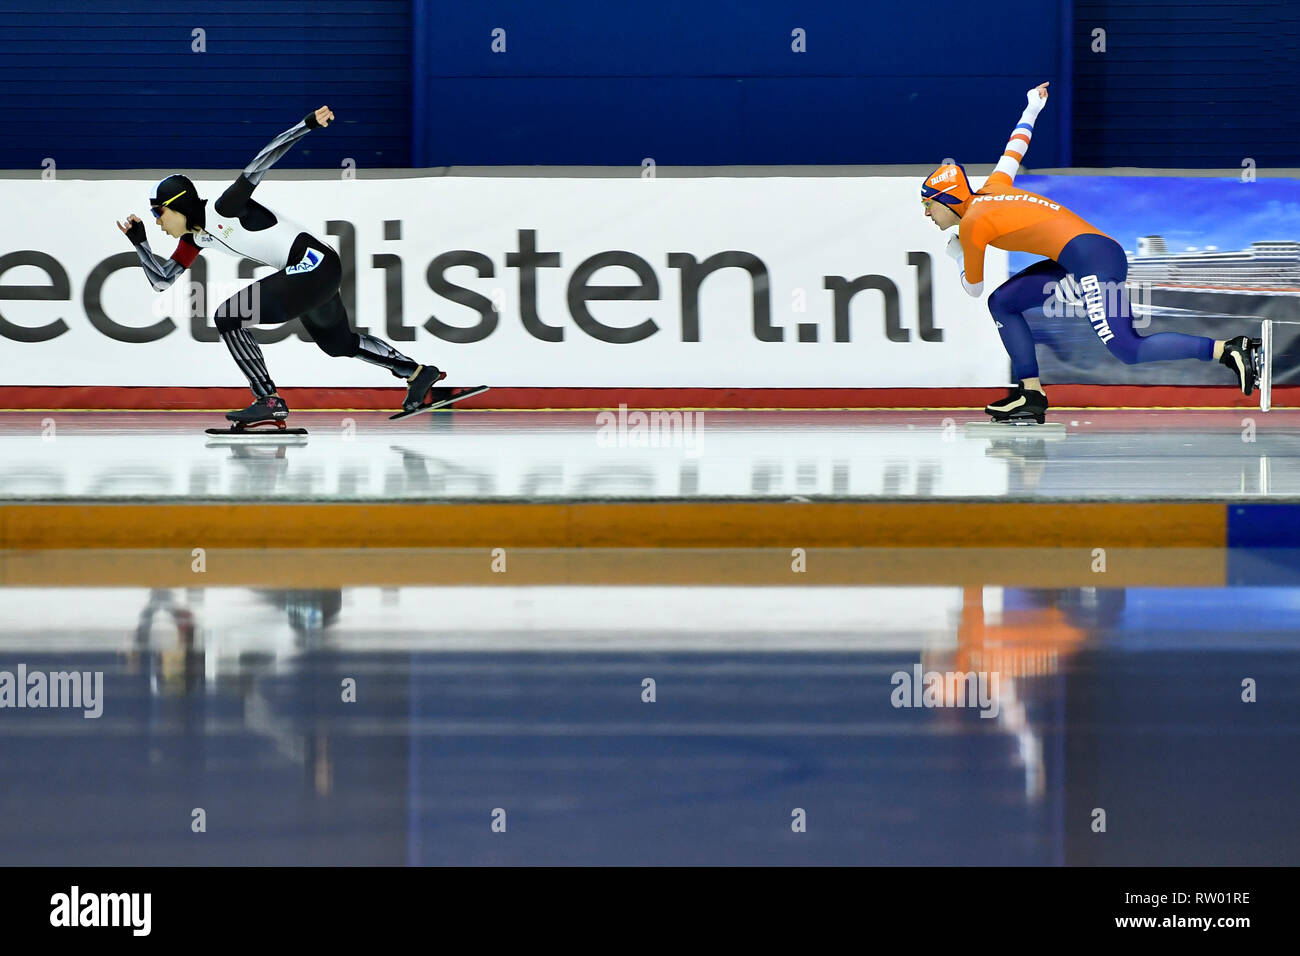 Speed Skating ISU World Championships Allround 2019 on March 2 2019 a the Olympics Oval in Calgary, Canada. Ireen Wust (NED) vs Miho Takagi (JPN) ) Credit: Huub Snoep/SCS/AFLO/Alamy Live News - Stock Image